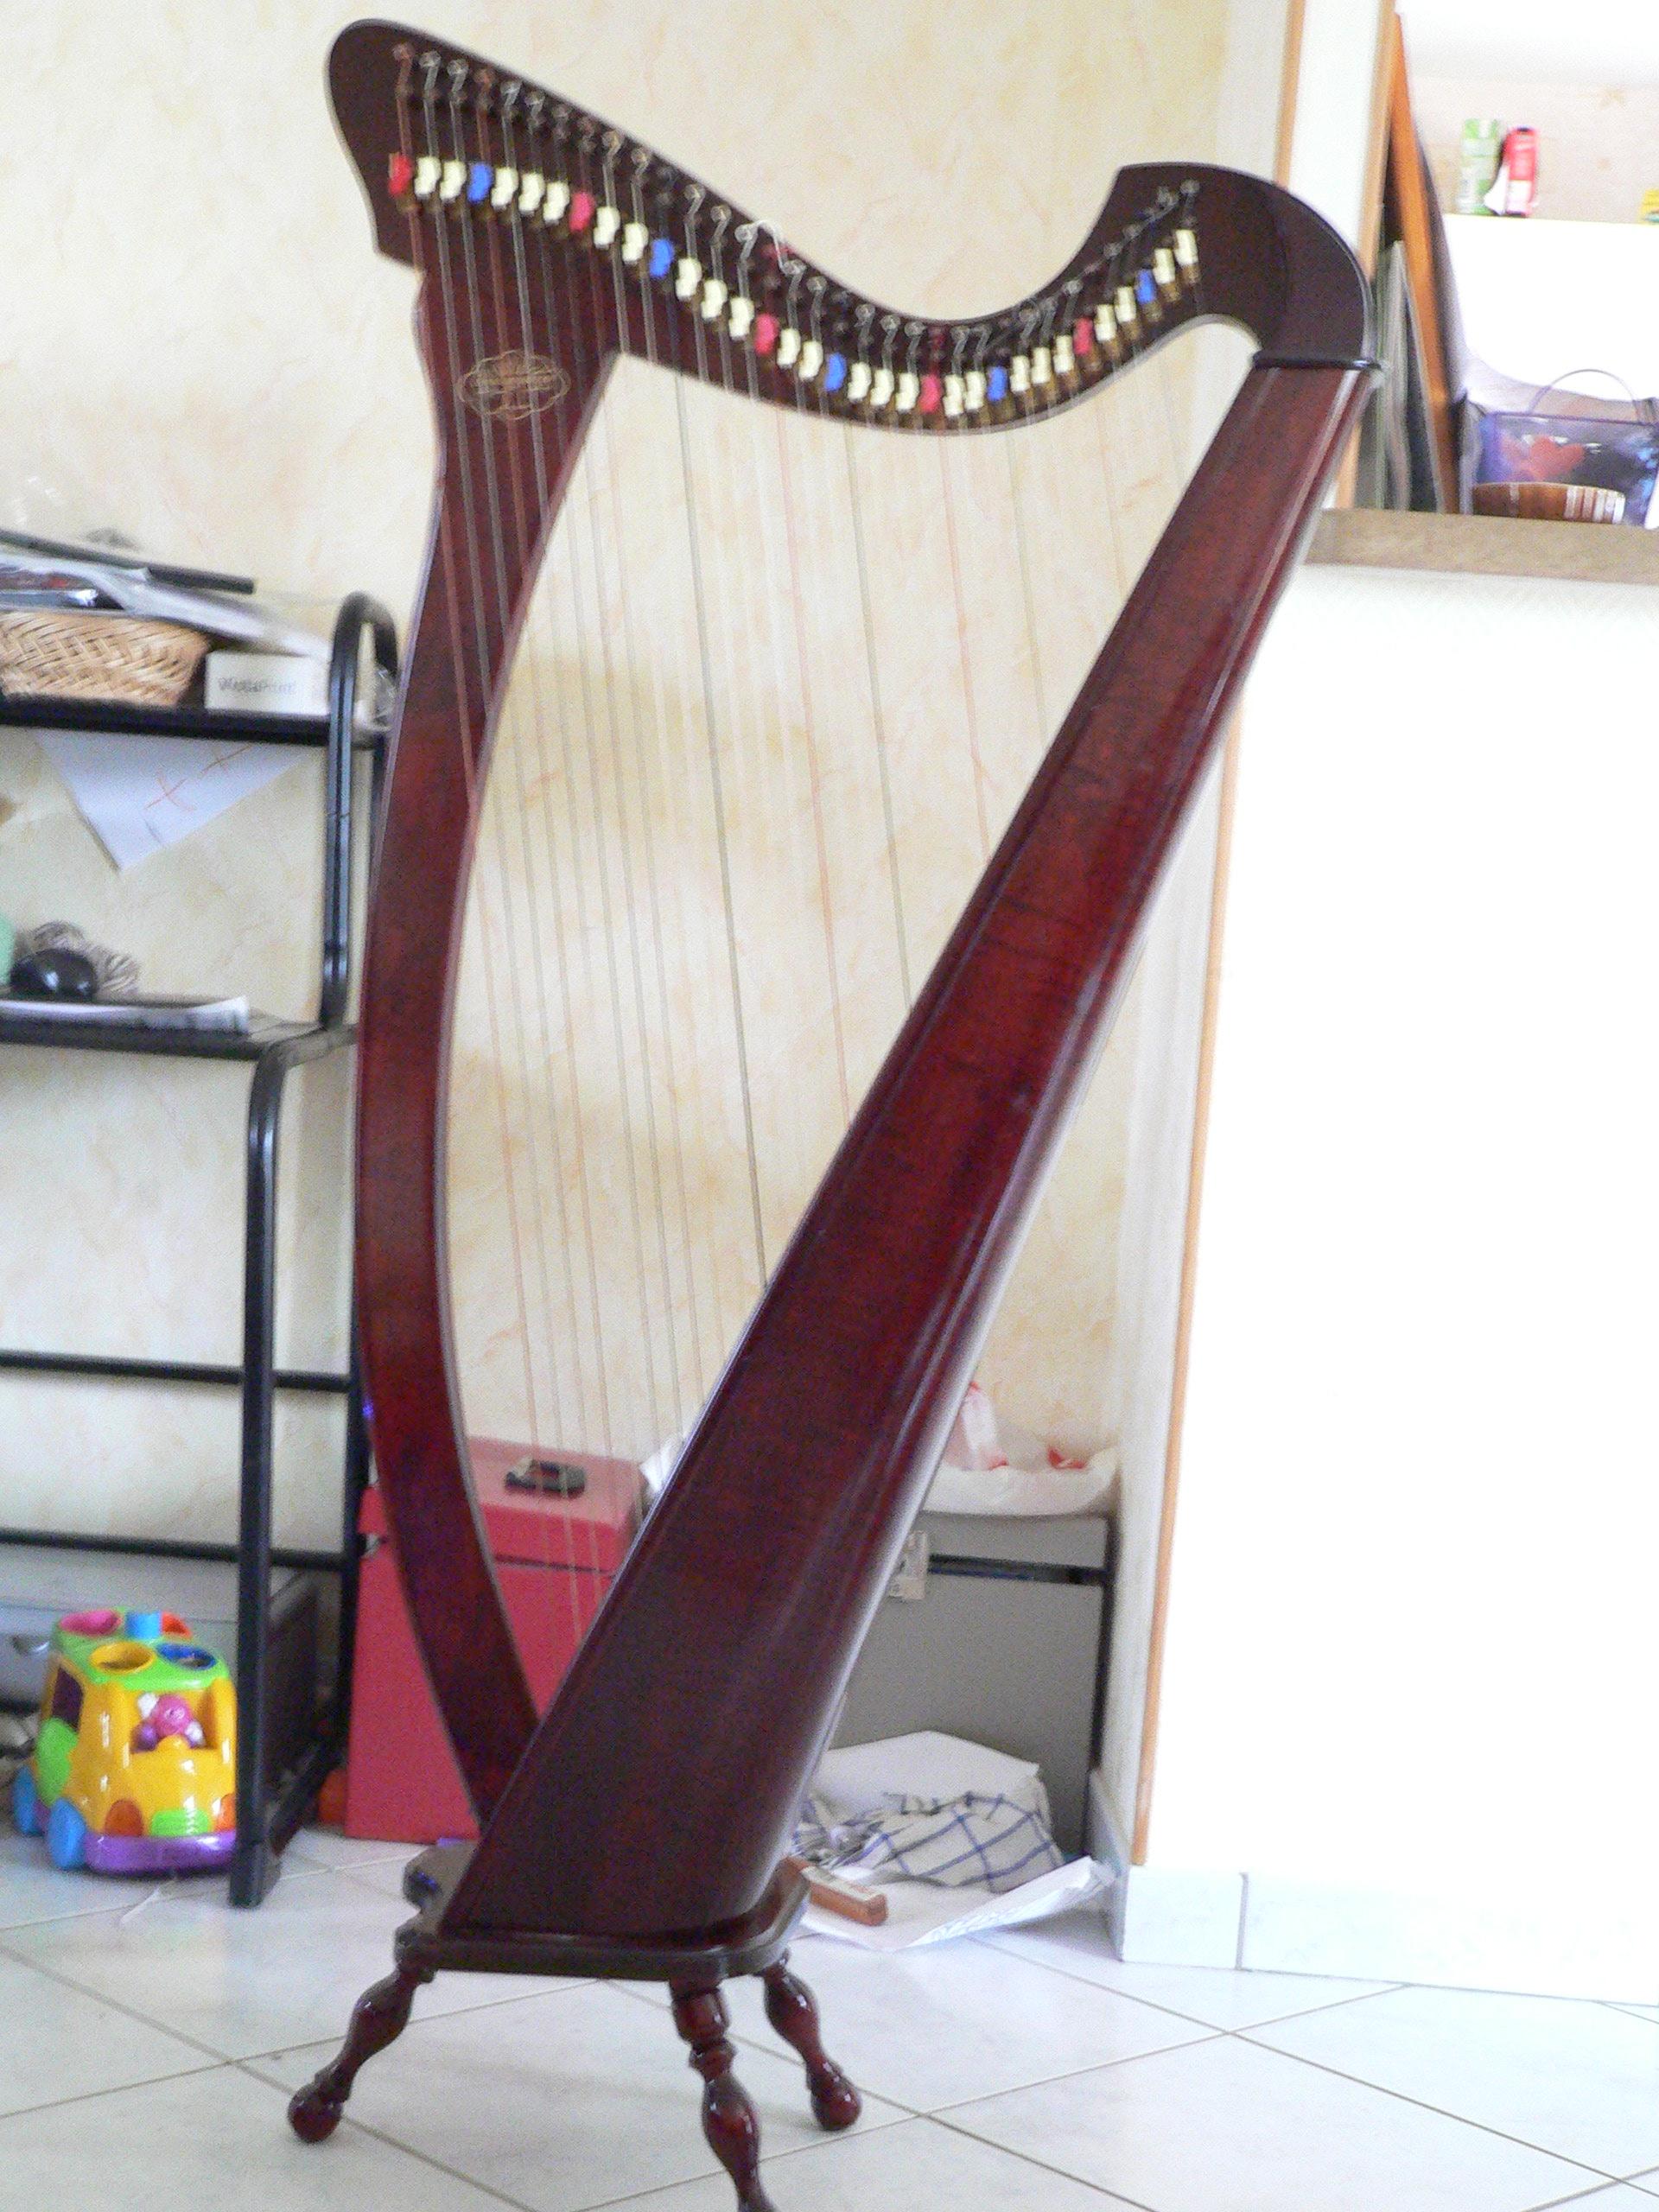 harpe simple mouvement camac harpe simple mouvement. Black Bedroom Furniture Sets. Home Design Ideas